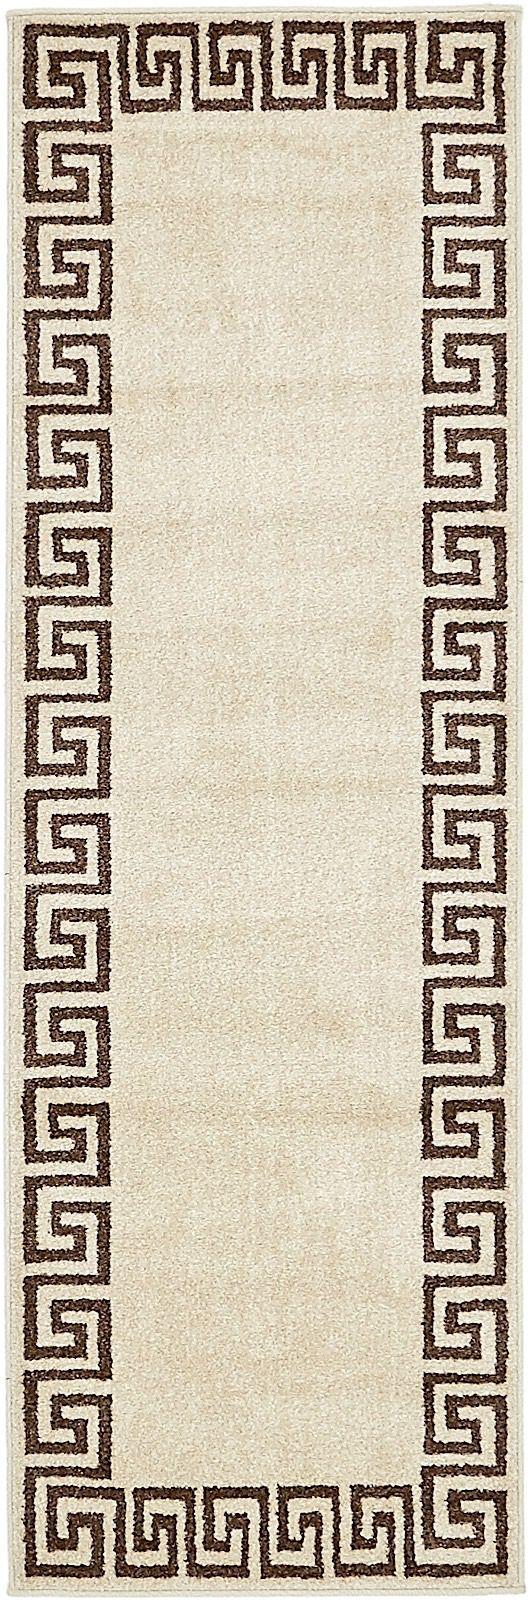 rugpal rhodes contemporary area rug collection